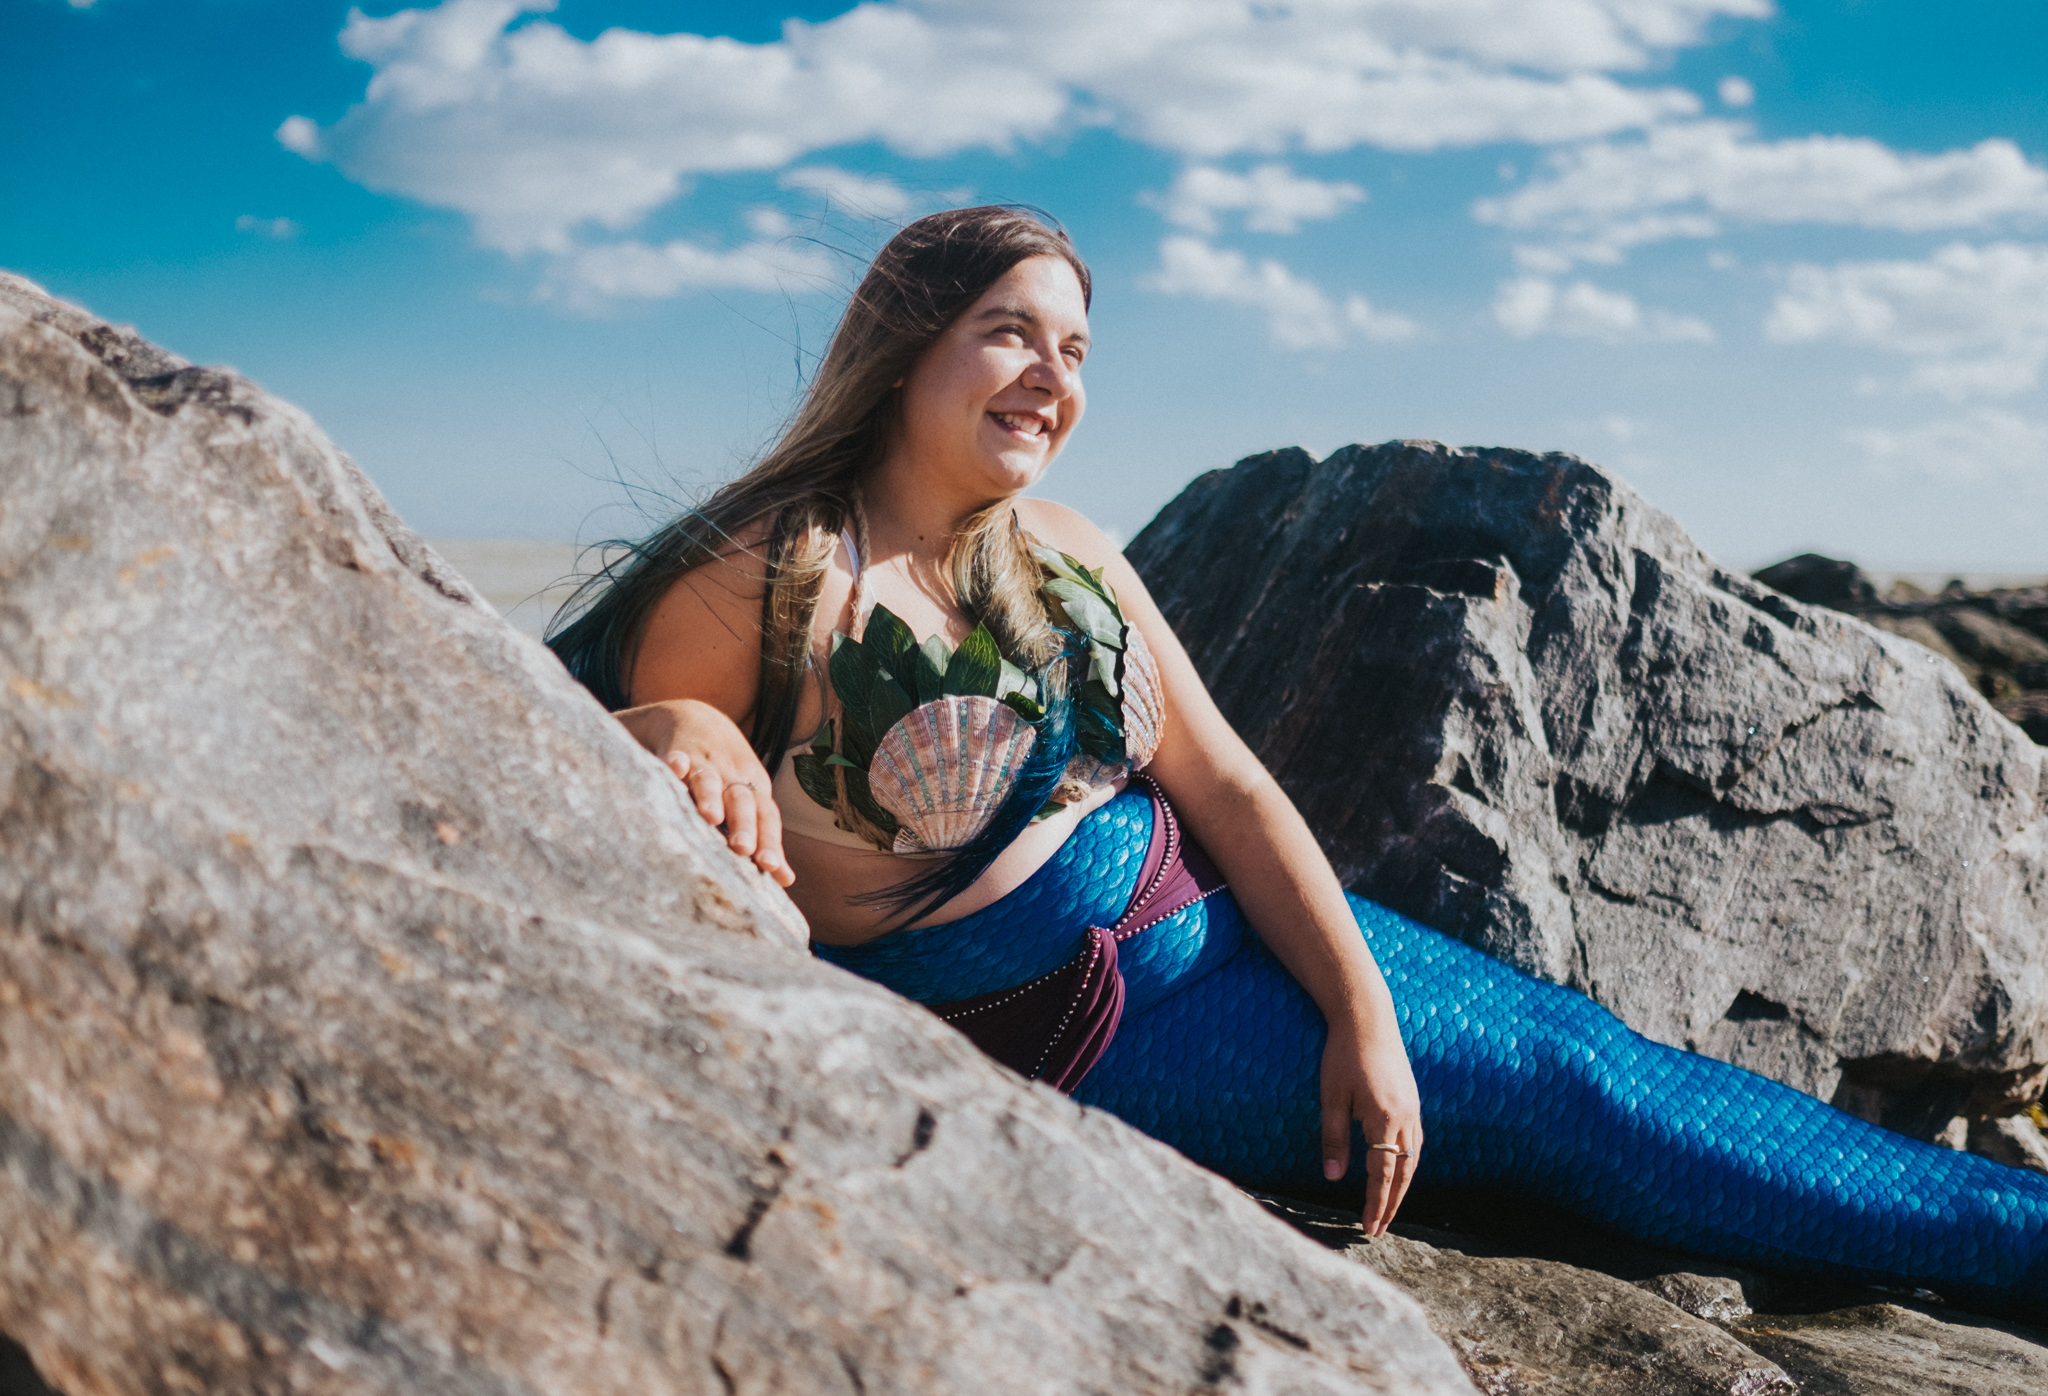 Body-Positive-Mermaids-Grace-Elizabeth-Mermaiding-UK-Alternative-Wedding-Photographer-Colchester-Essex-Suffolk-Norfolk-Devon (39 of 59).jpg